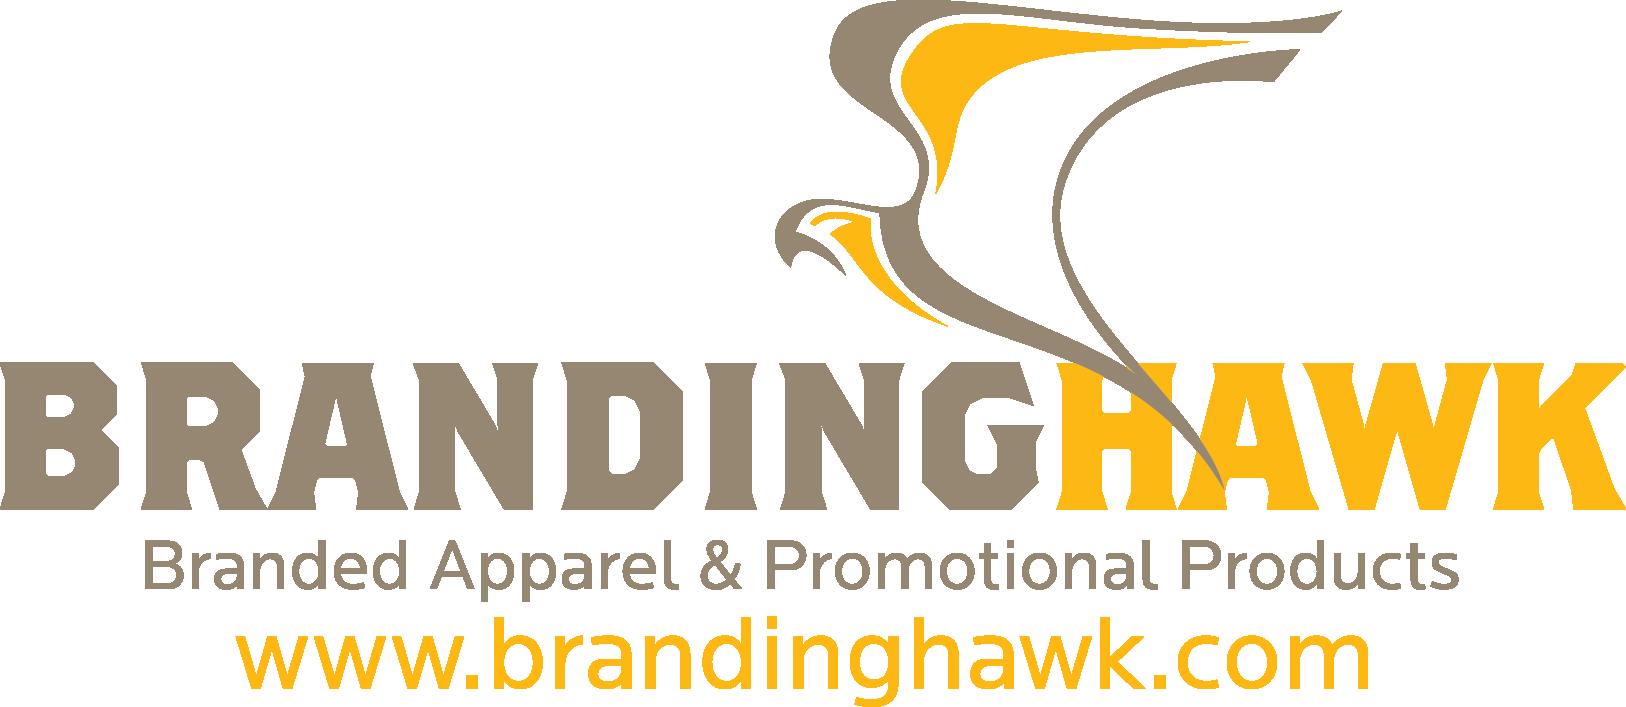 Branding Hawk Logo